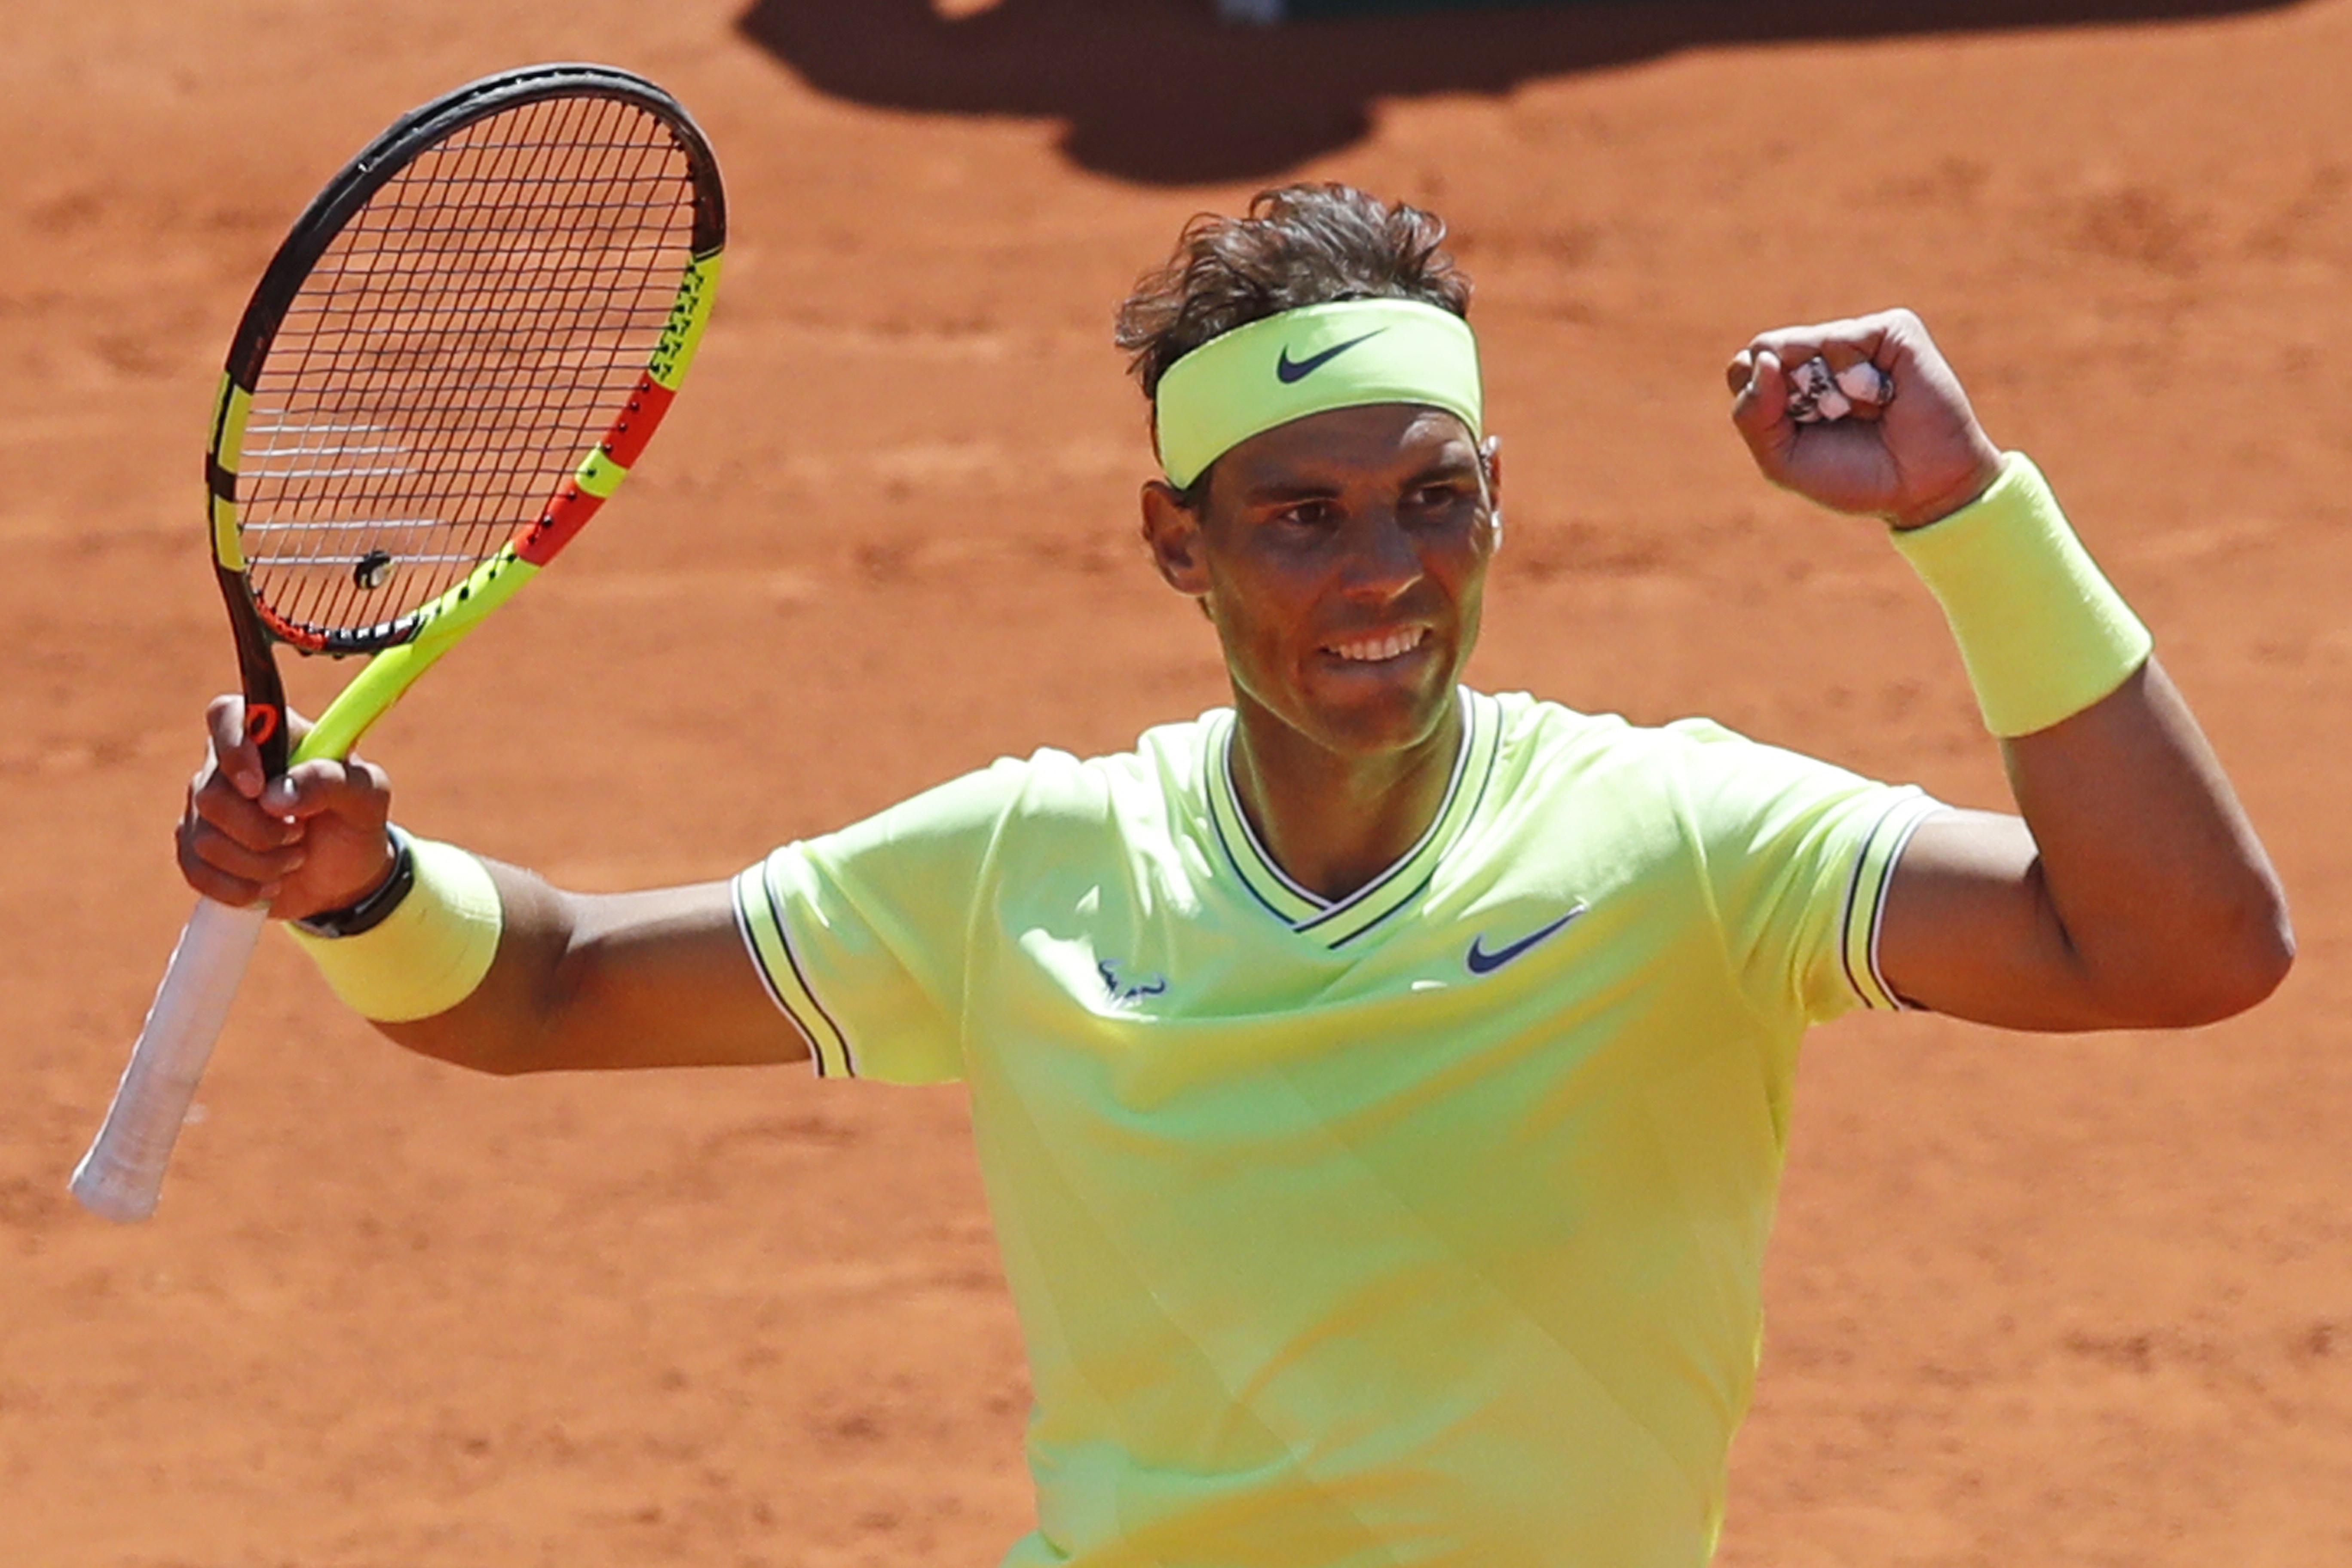 Rafael Nadal breezes by Roger Federer in French Open ...